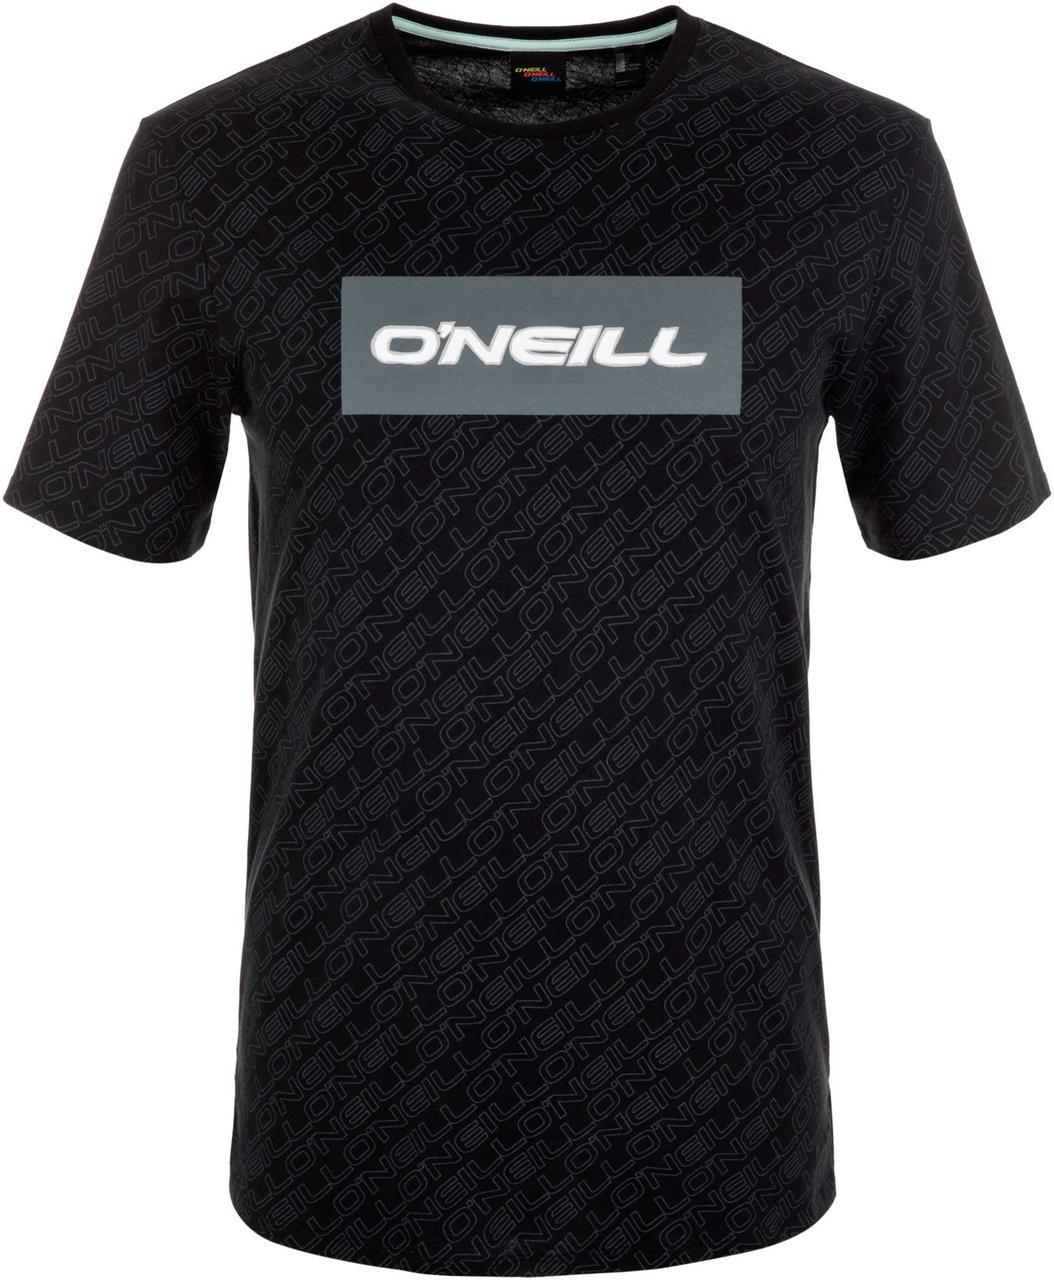 ФУТБОЛКА МУЖСКАЯ O'NEILL LM ALL OVER PRING T-SHIRT (9A3610-9900)